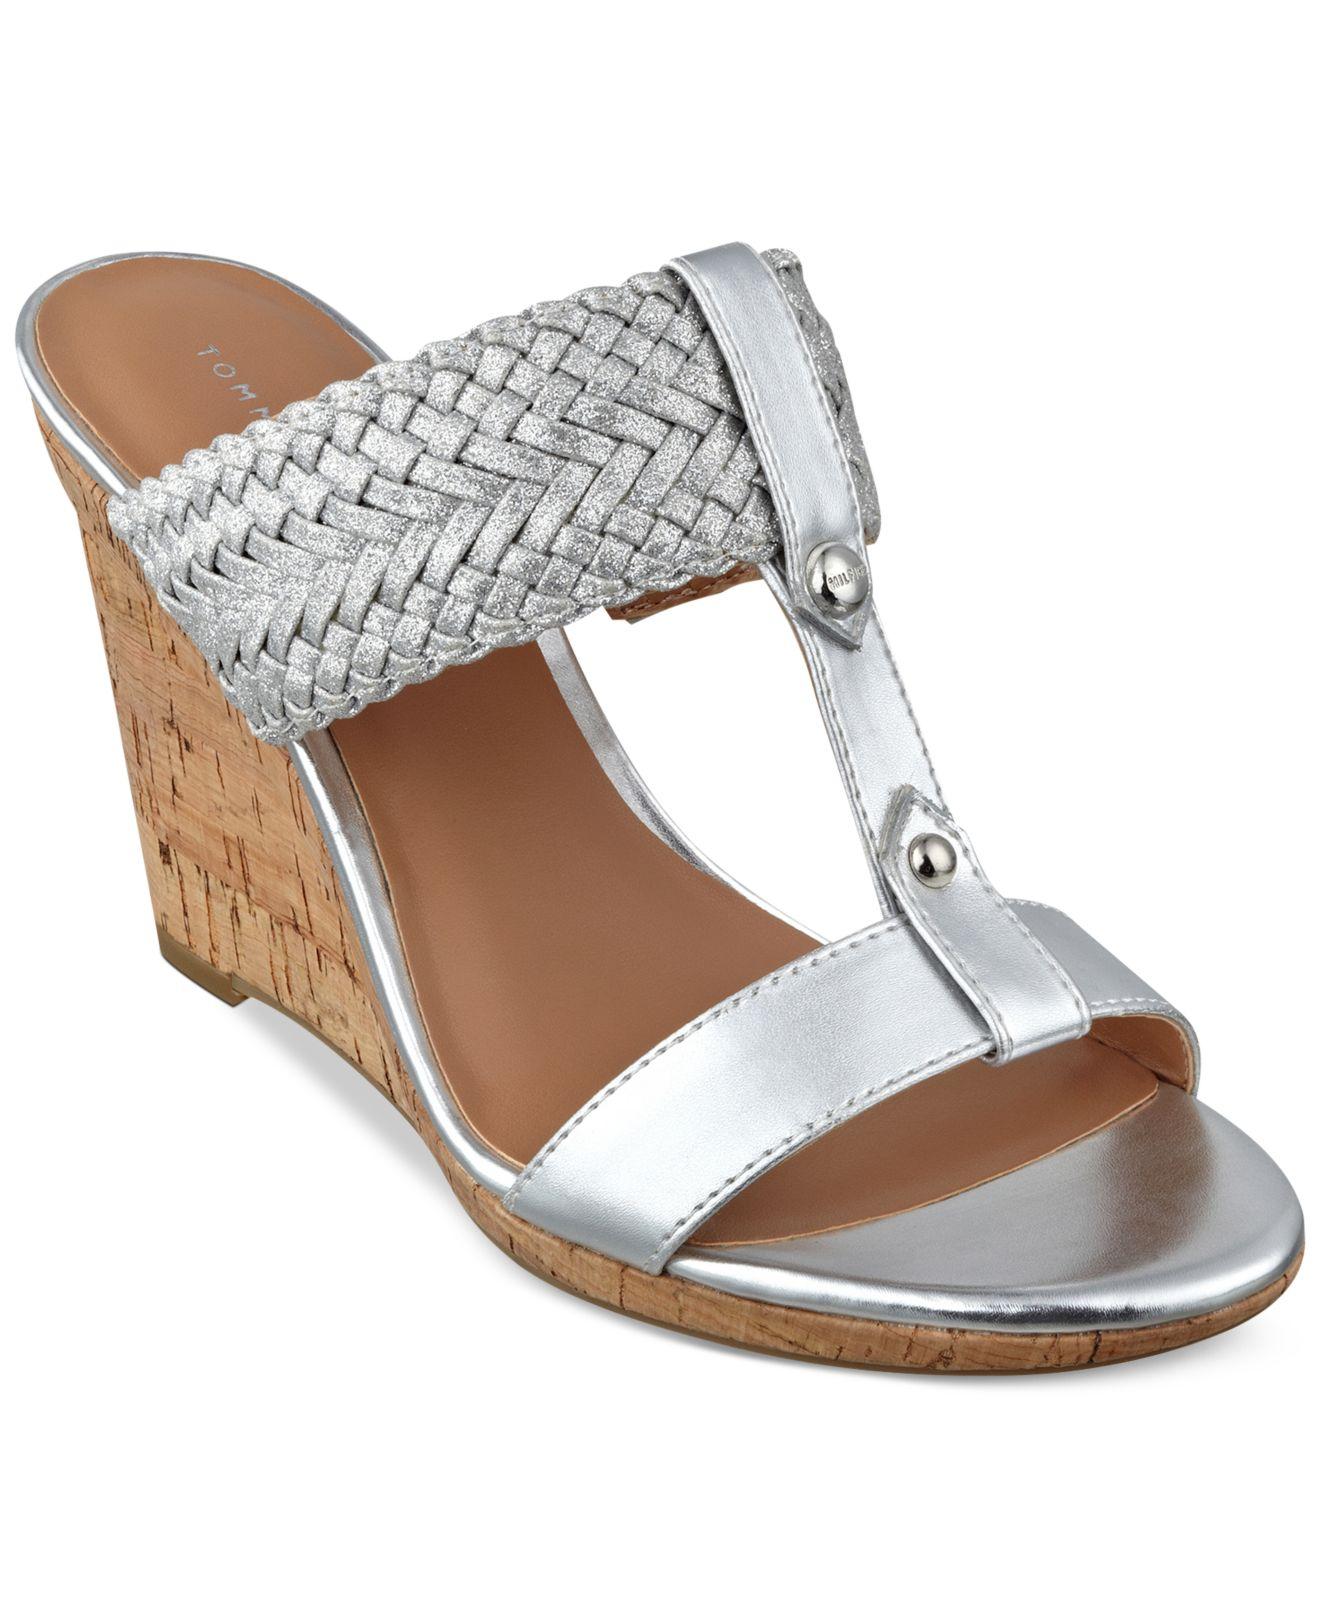 tommy hilfiger women 39 s eleona wedge sandals in metallic lyst. Black Bedroom Furniture Sets. Home Design Ideas